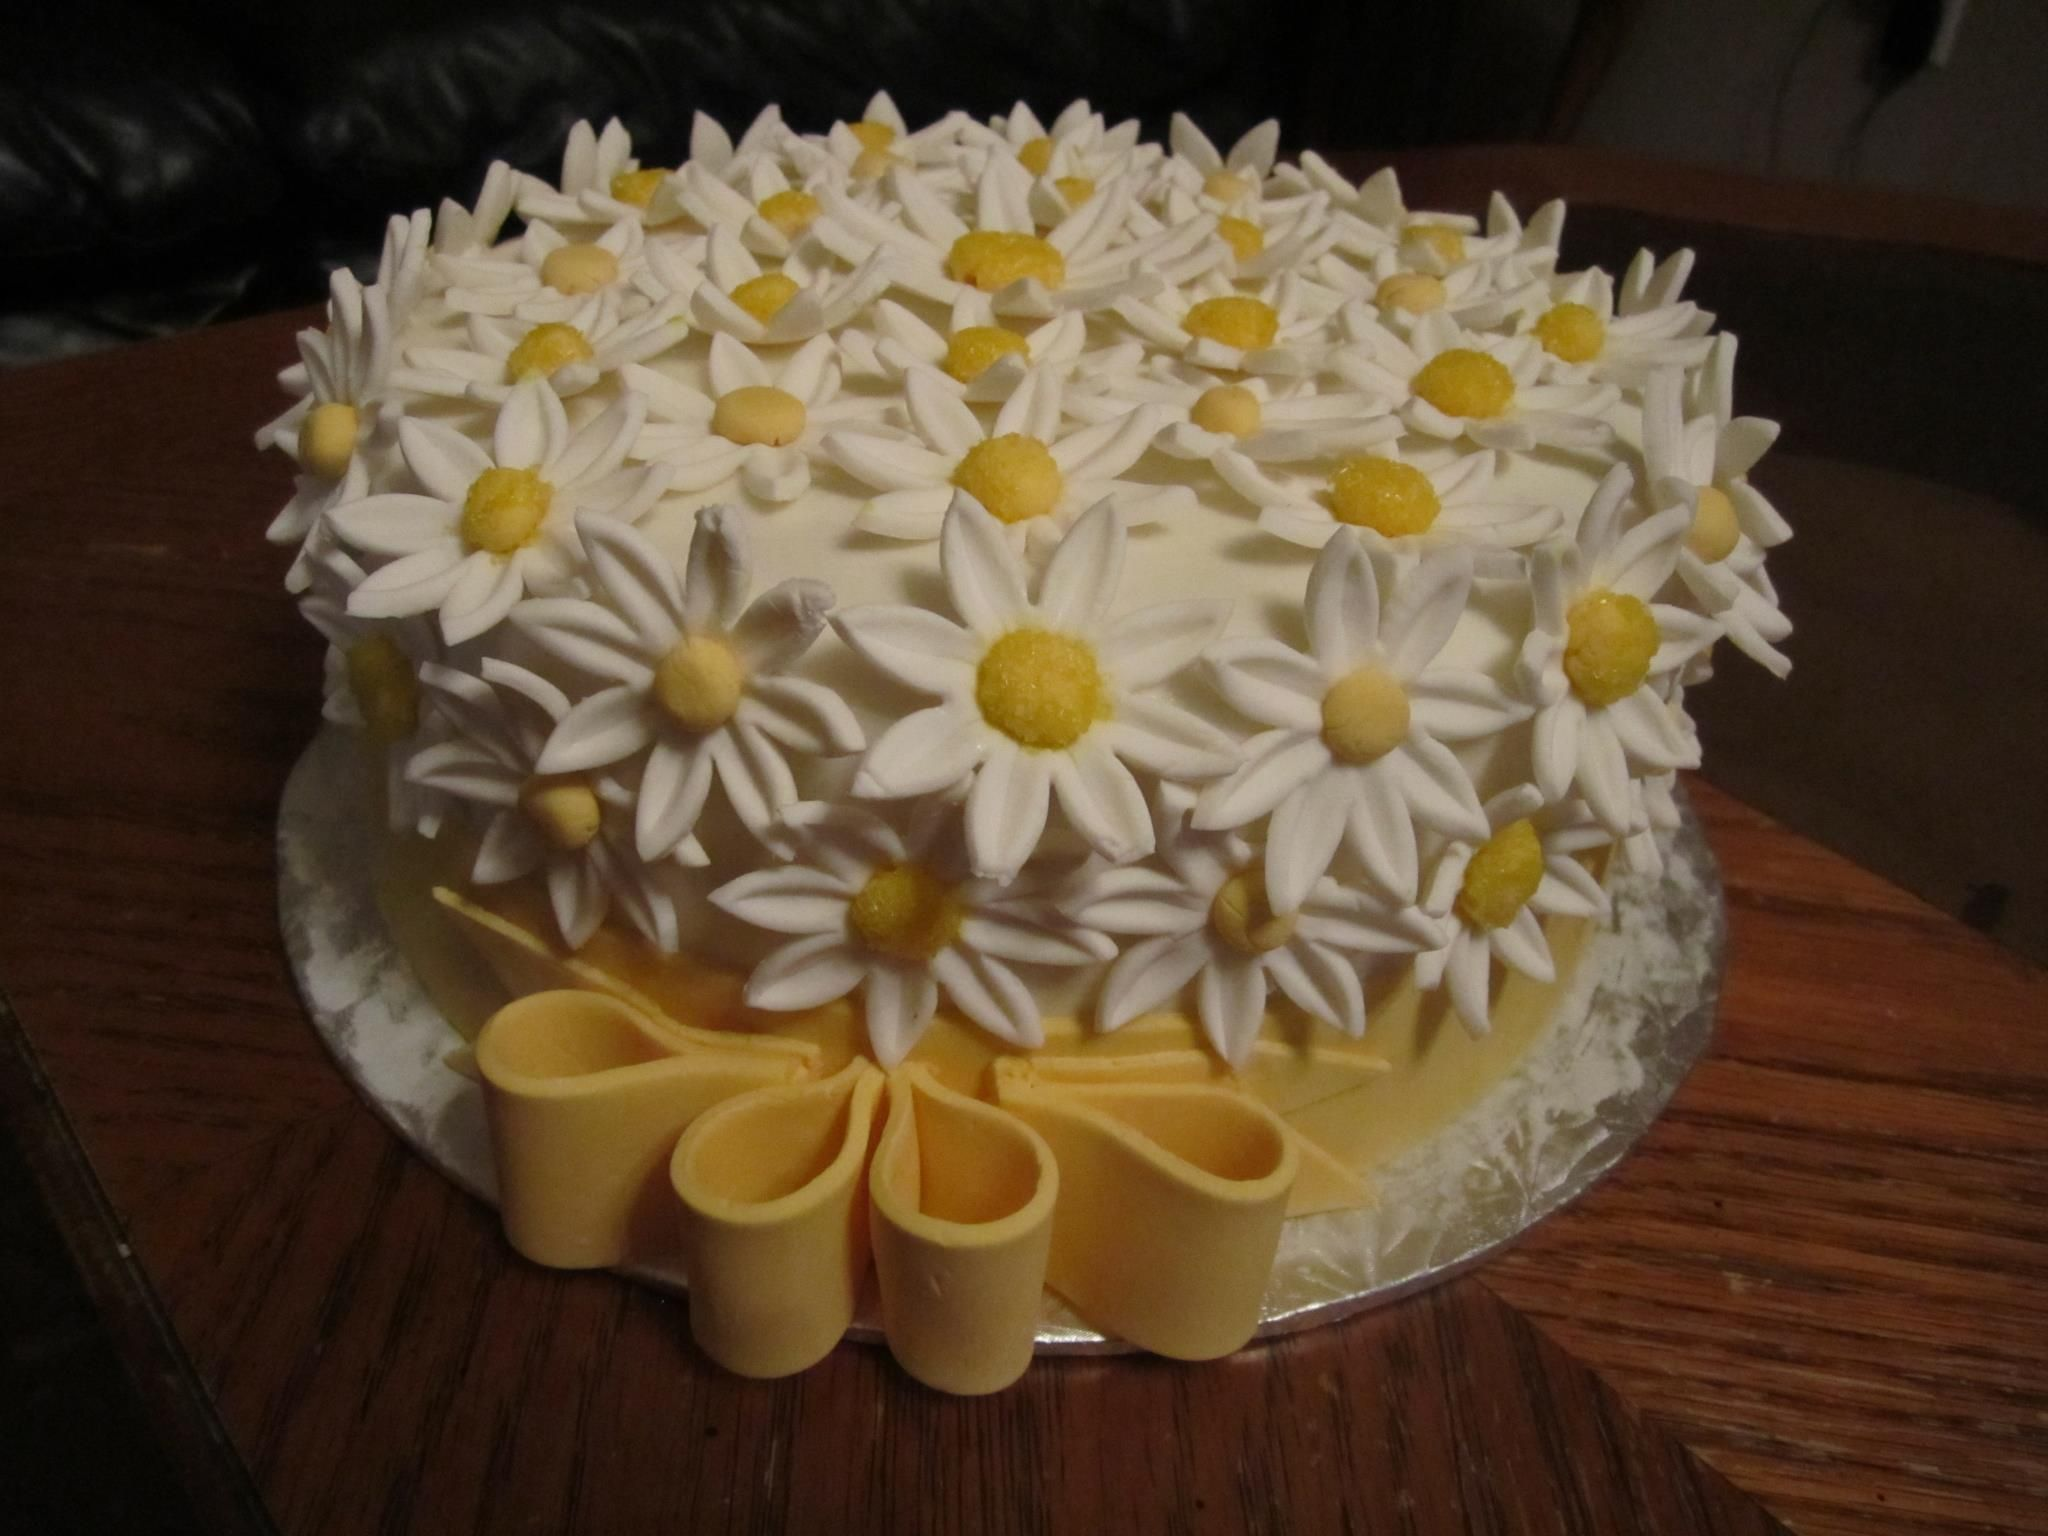 Pleasing Daisy Birthday Cake Con Imagenes Tortas Pasteles Mini Pasteles Funny Birthday Cards Online Alyptdamsfinfo